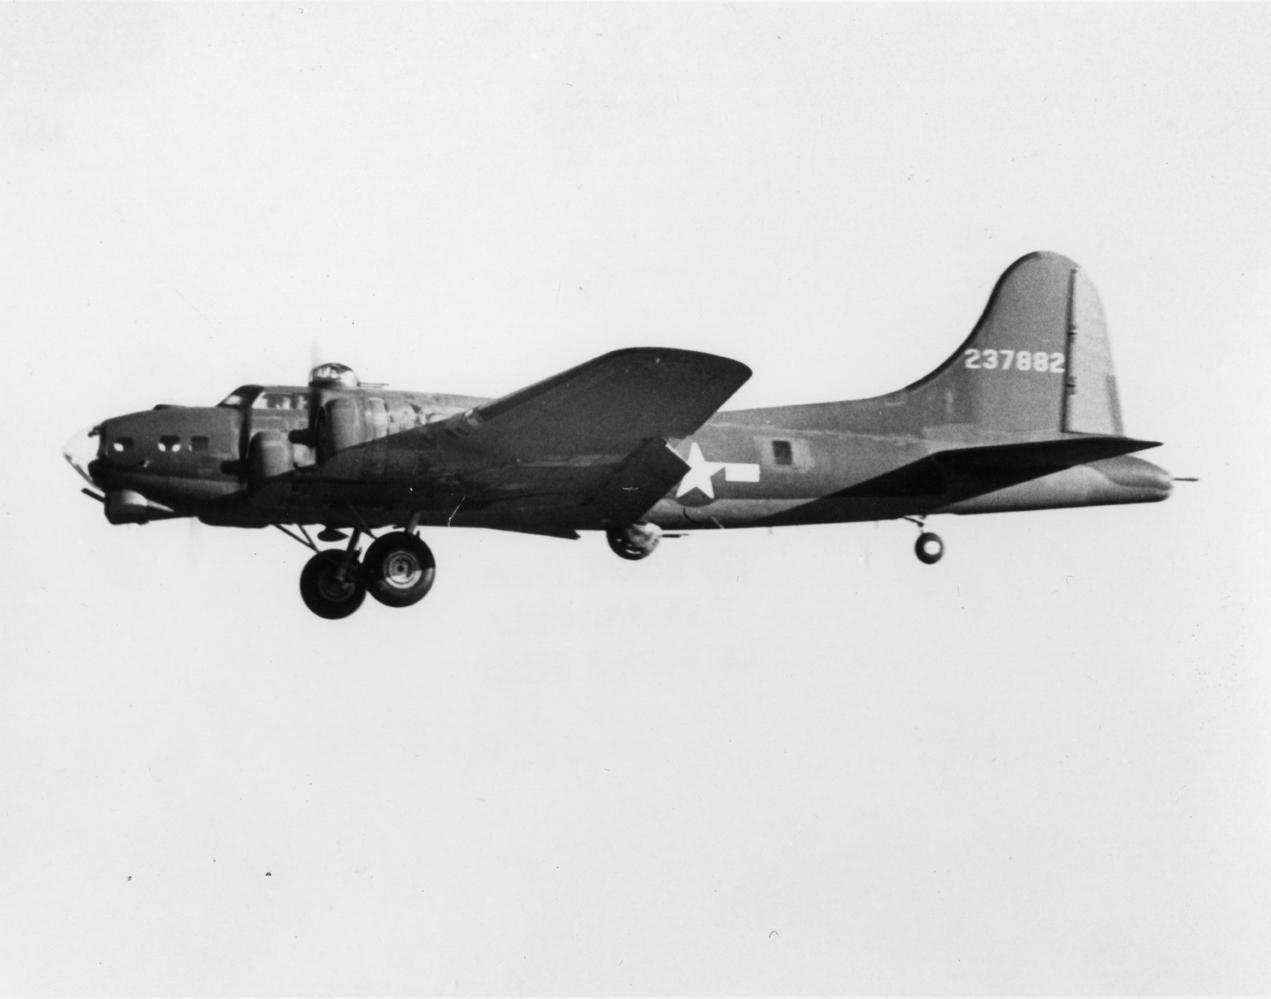 B-17 #42-37882 / Hard Time aka A-Good-Bett aka Blues in the Reich